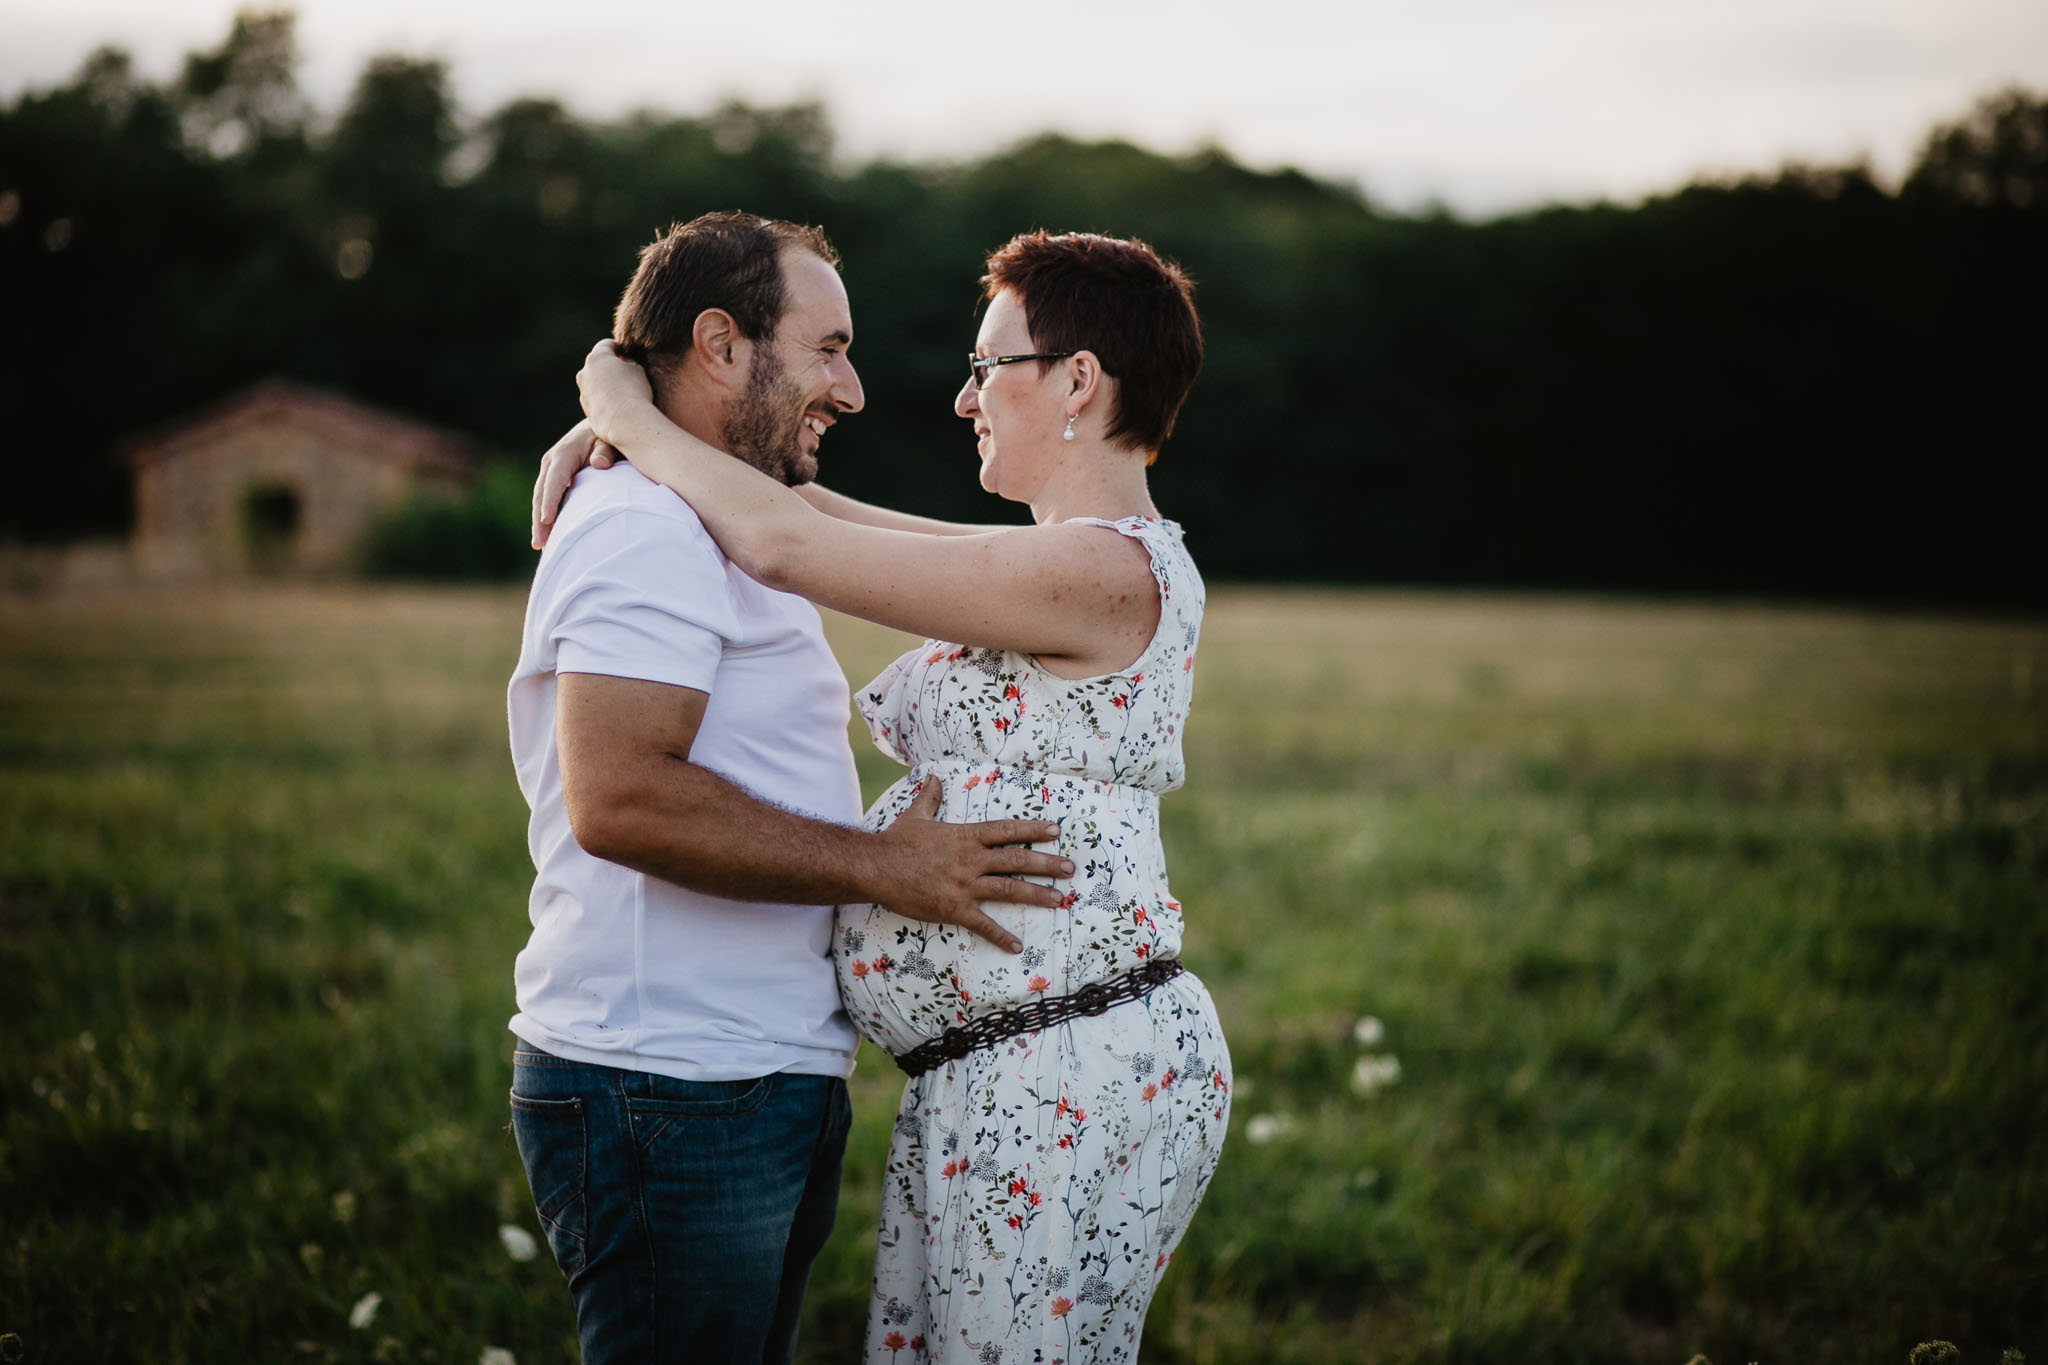 grossesse-femme-enceinte-couple-nature-campagne-ingold-photographe-46.jpg